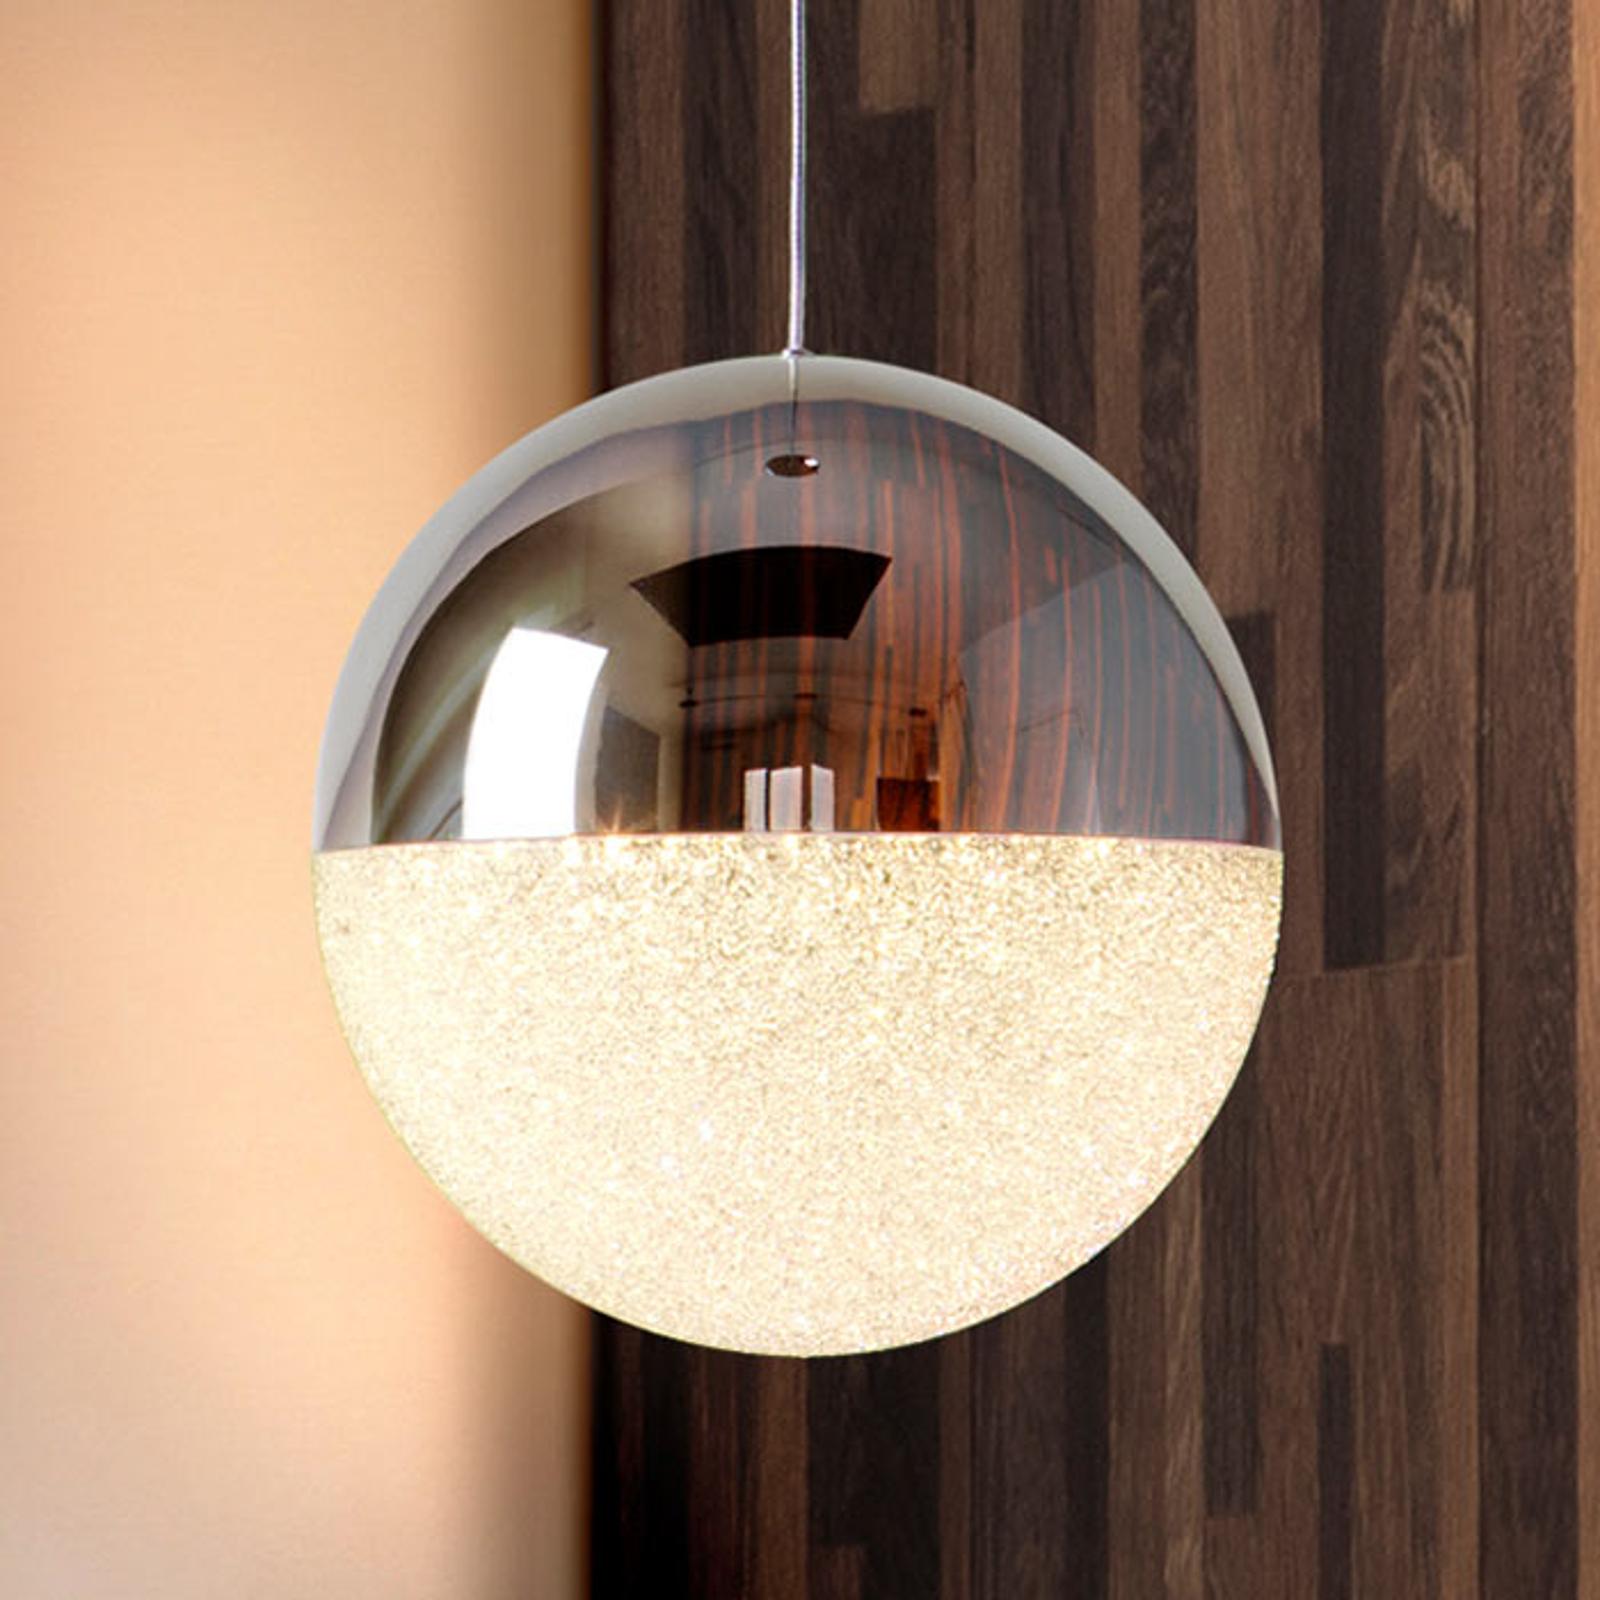 Kugelförmige LED-Hängeleuchte Sphere, Ø 20 cm